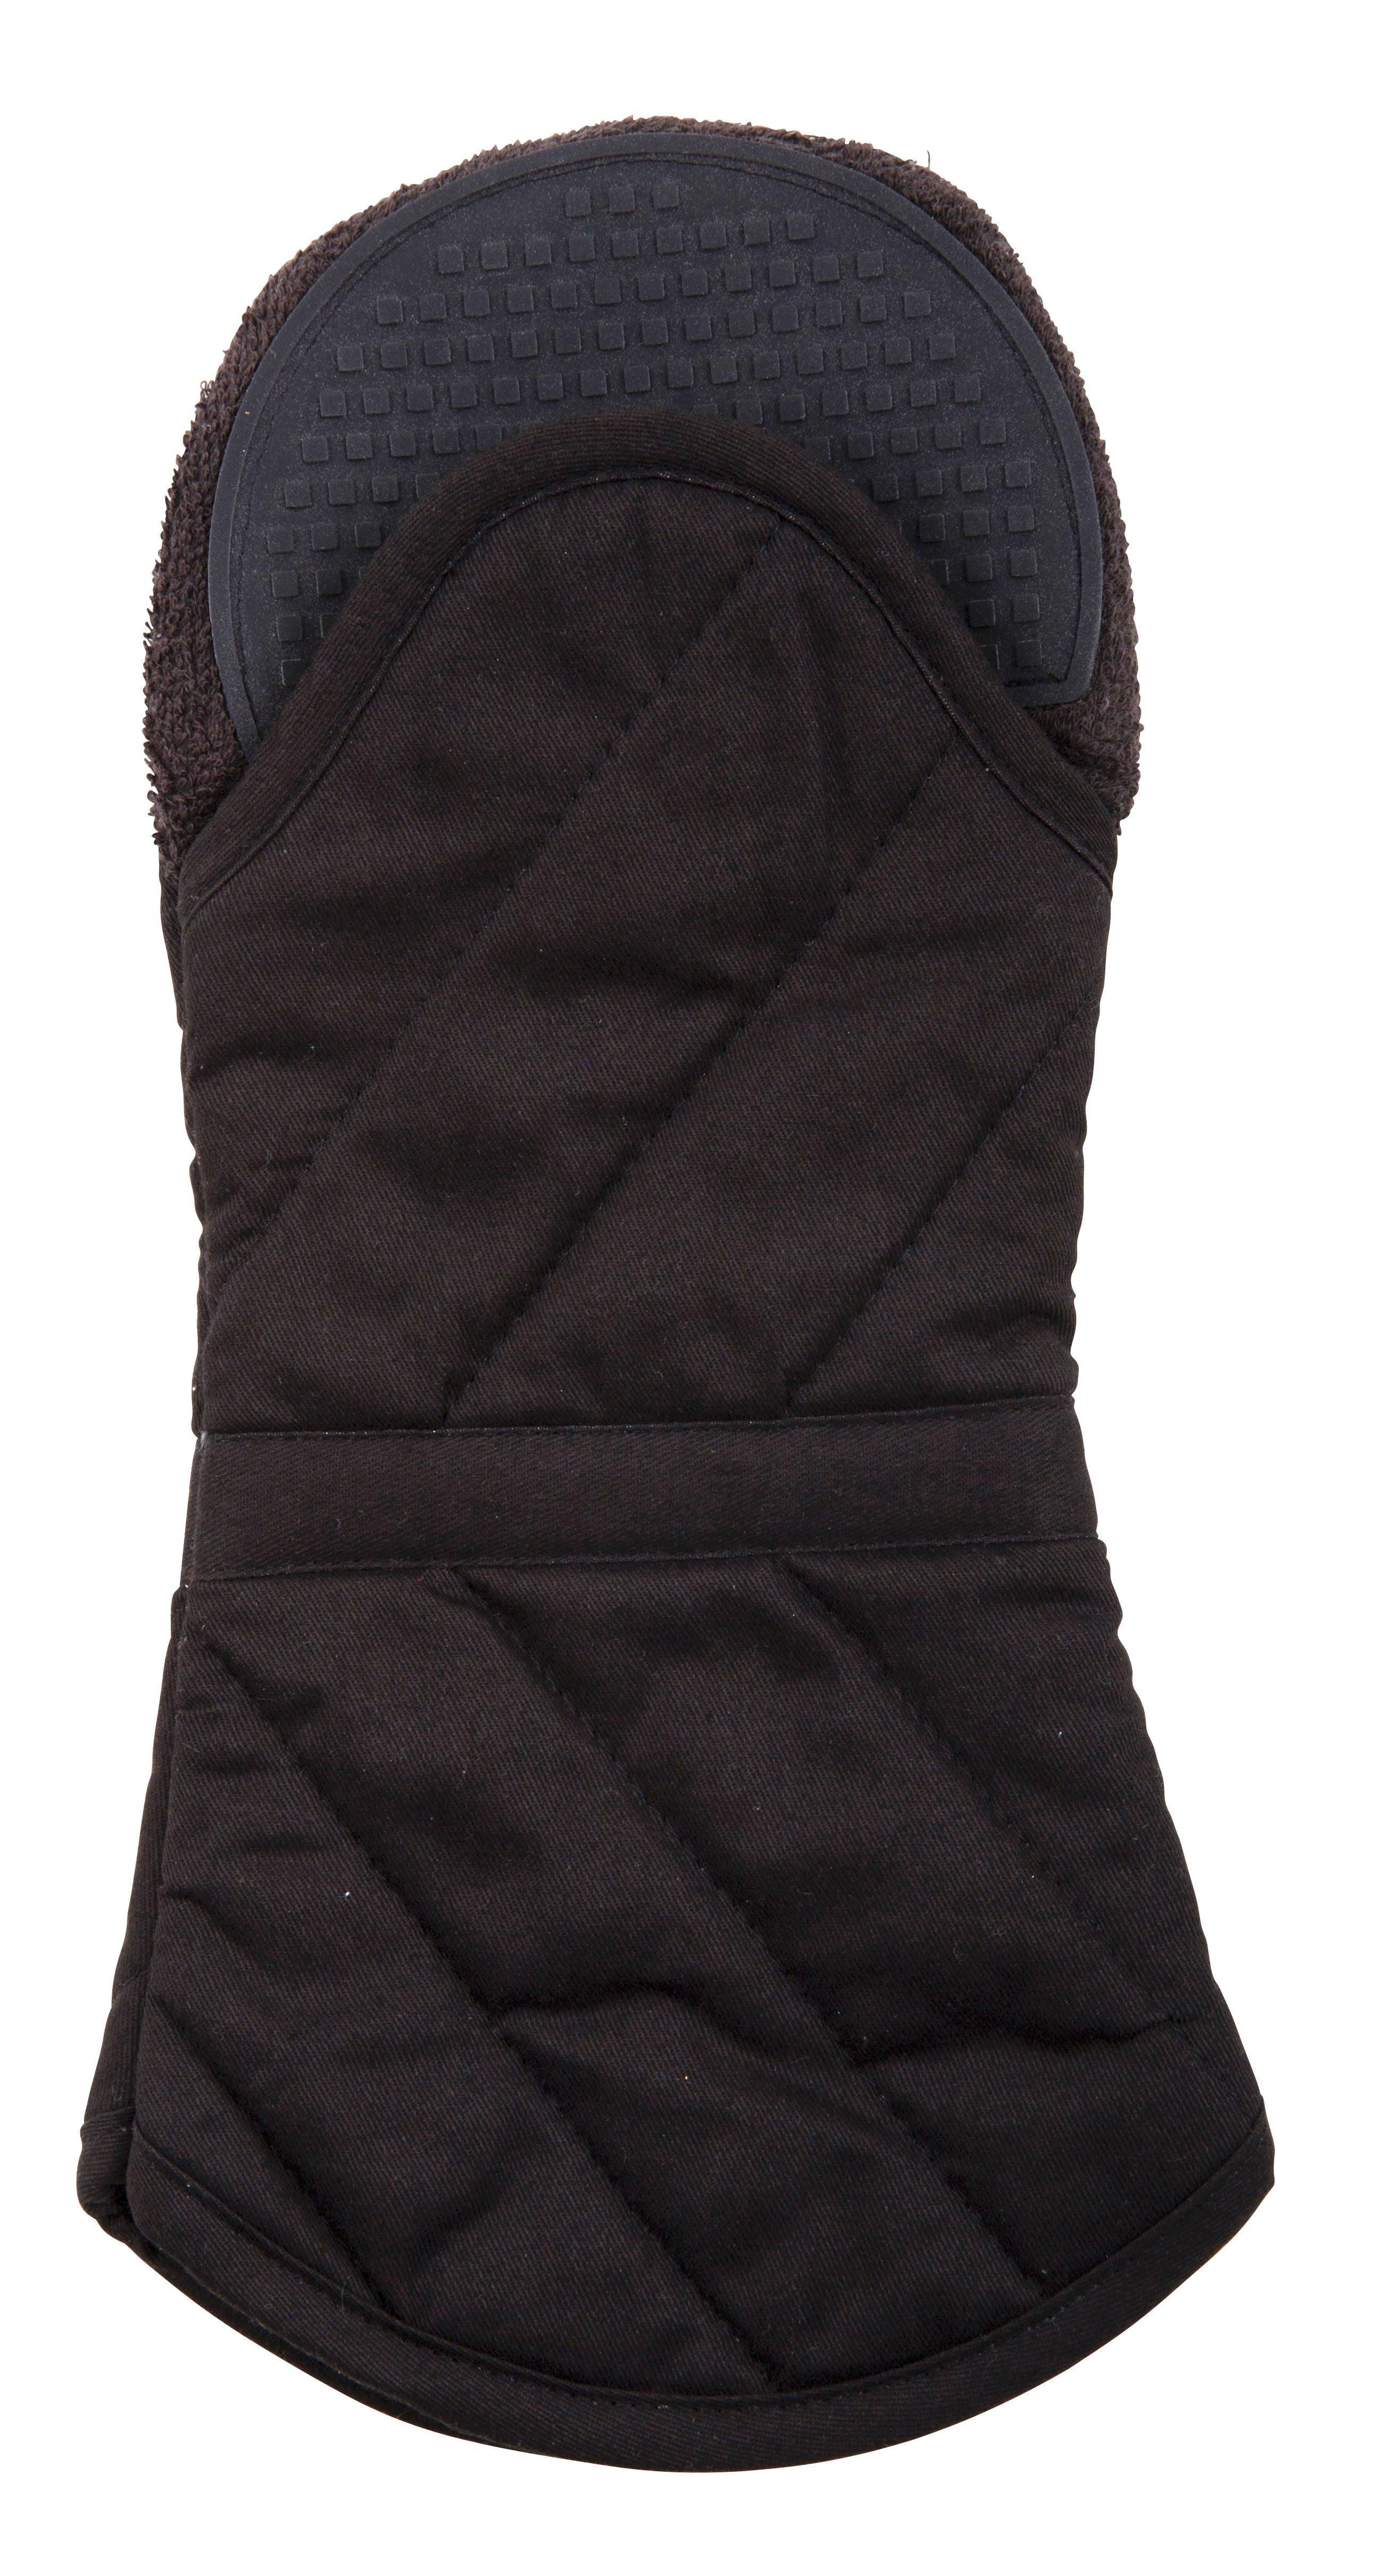 Savannah Safe & Snug Oven Glove Black 34x16.5x4cm